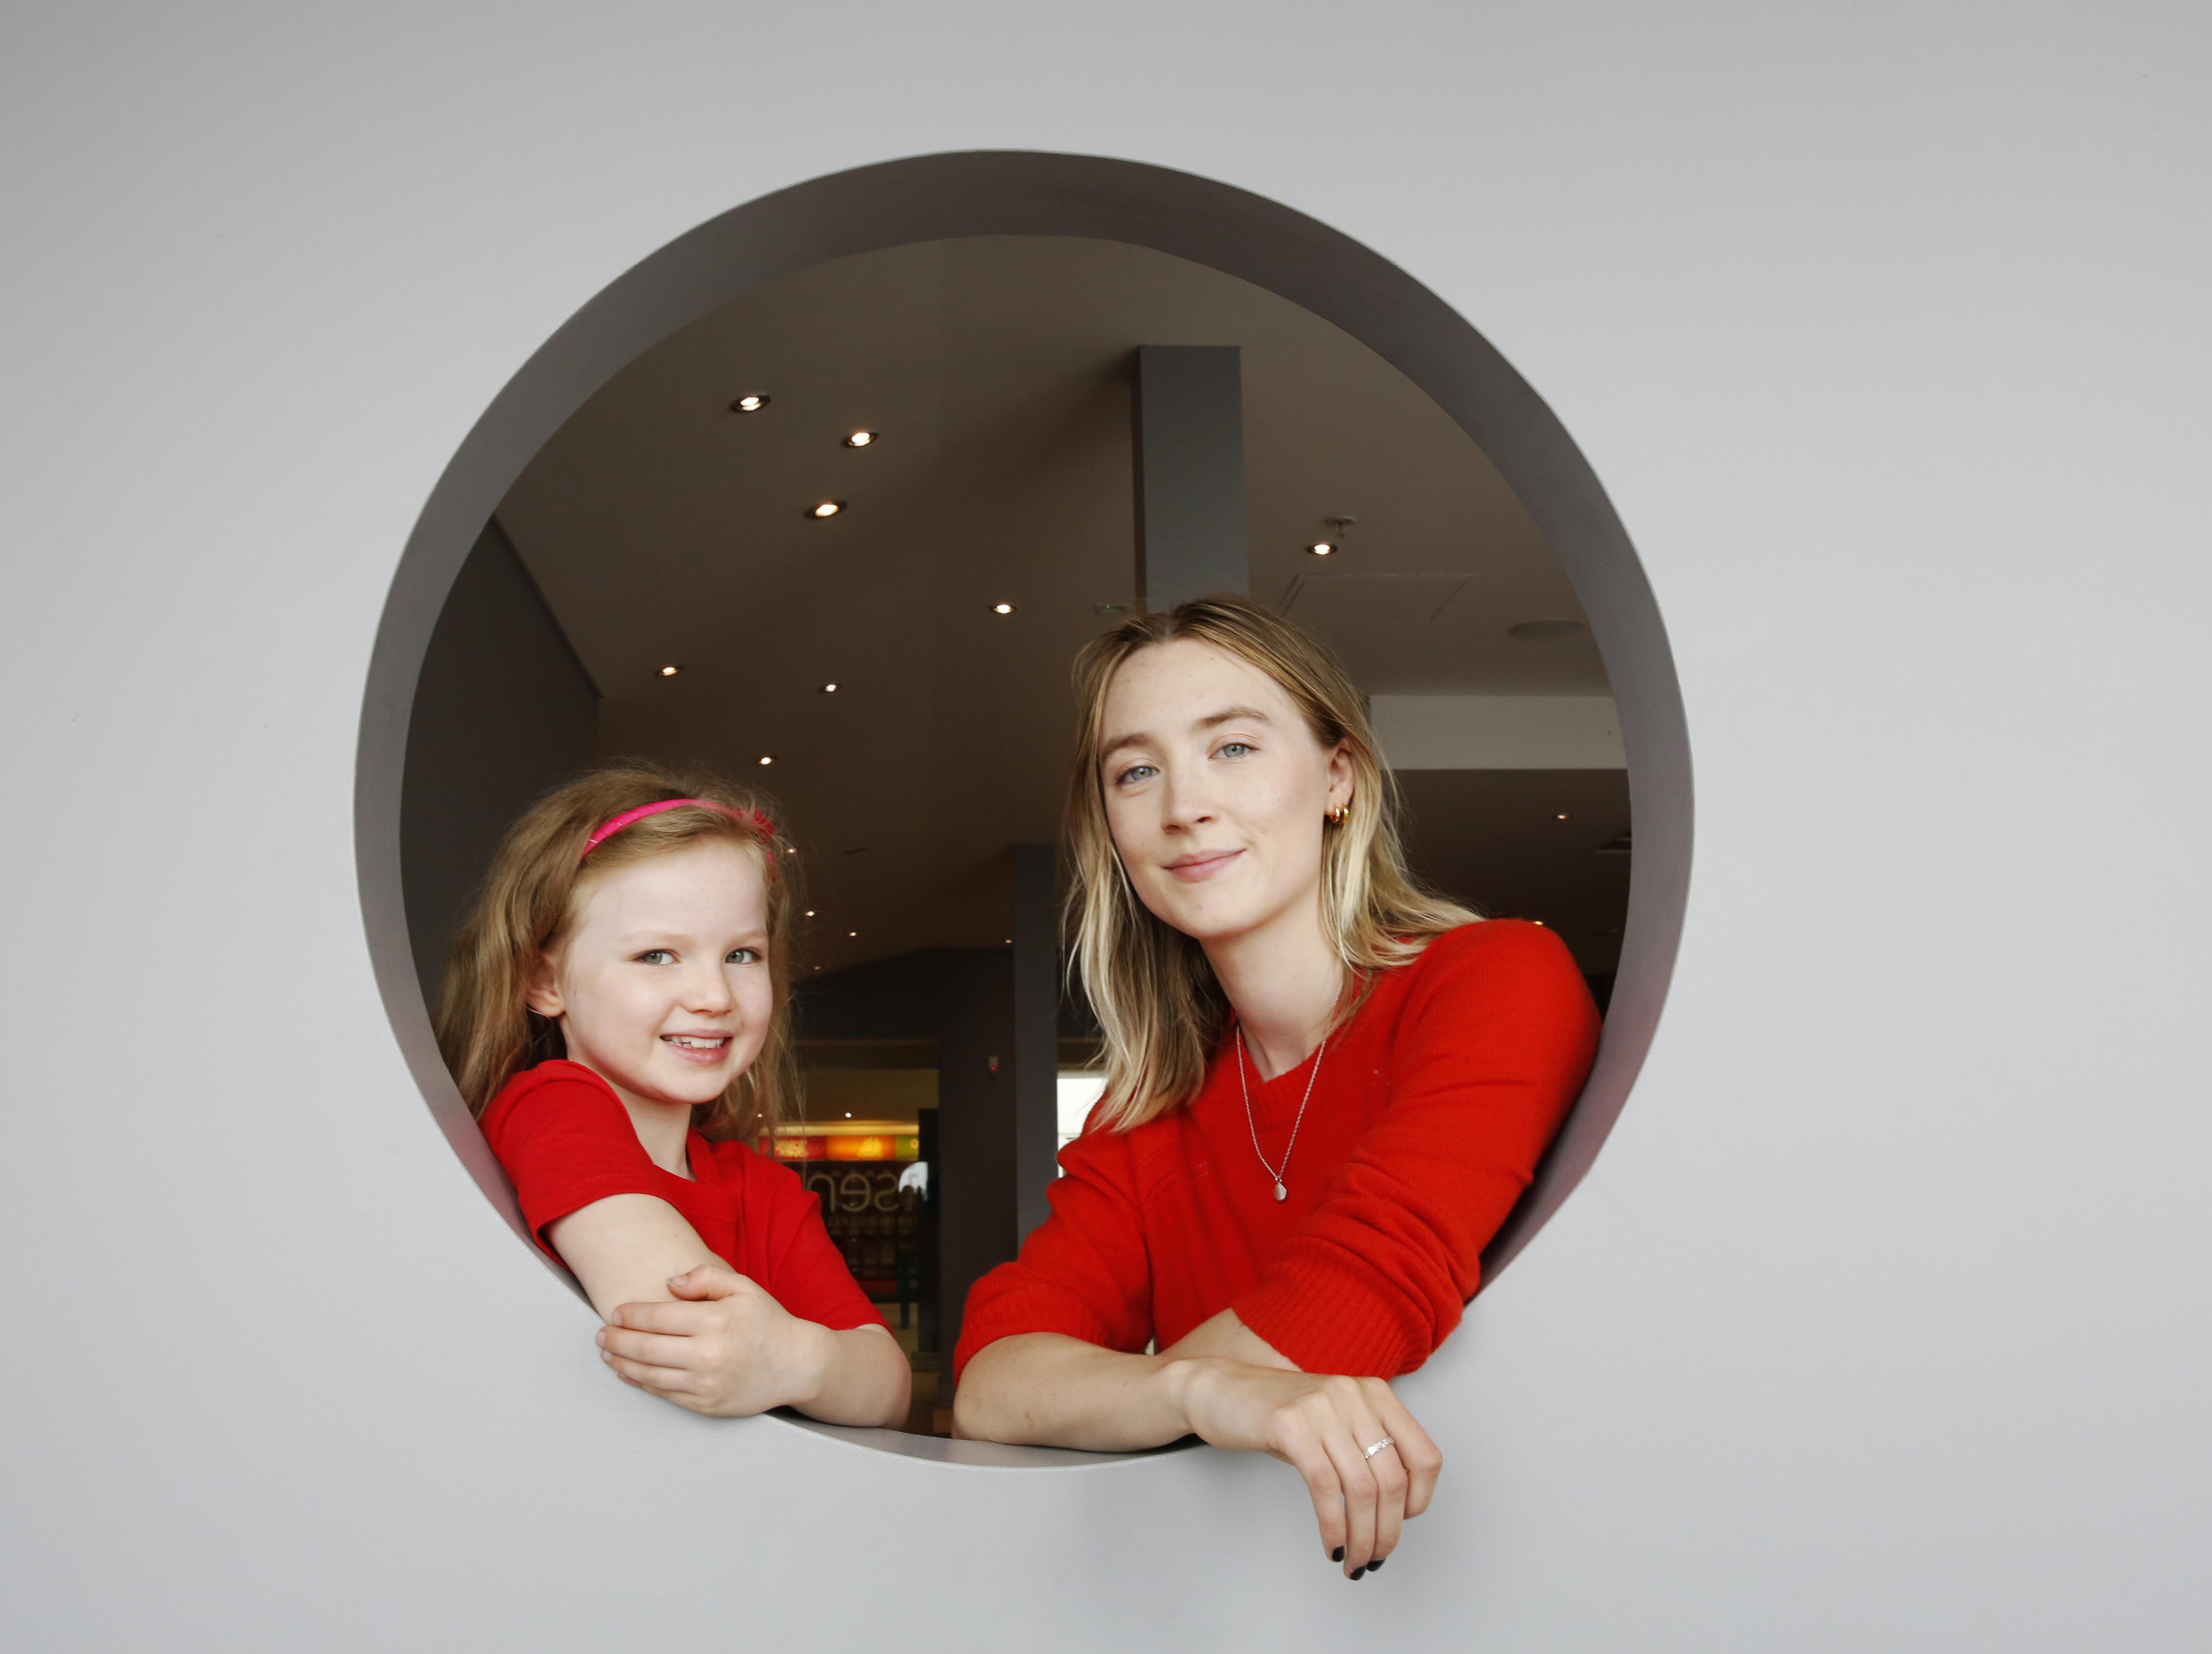 Molly McCann photoshoot with Saoirse Ronan